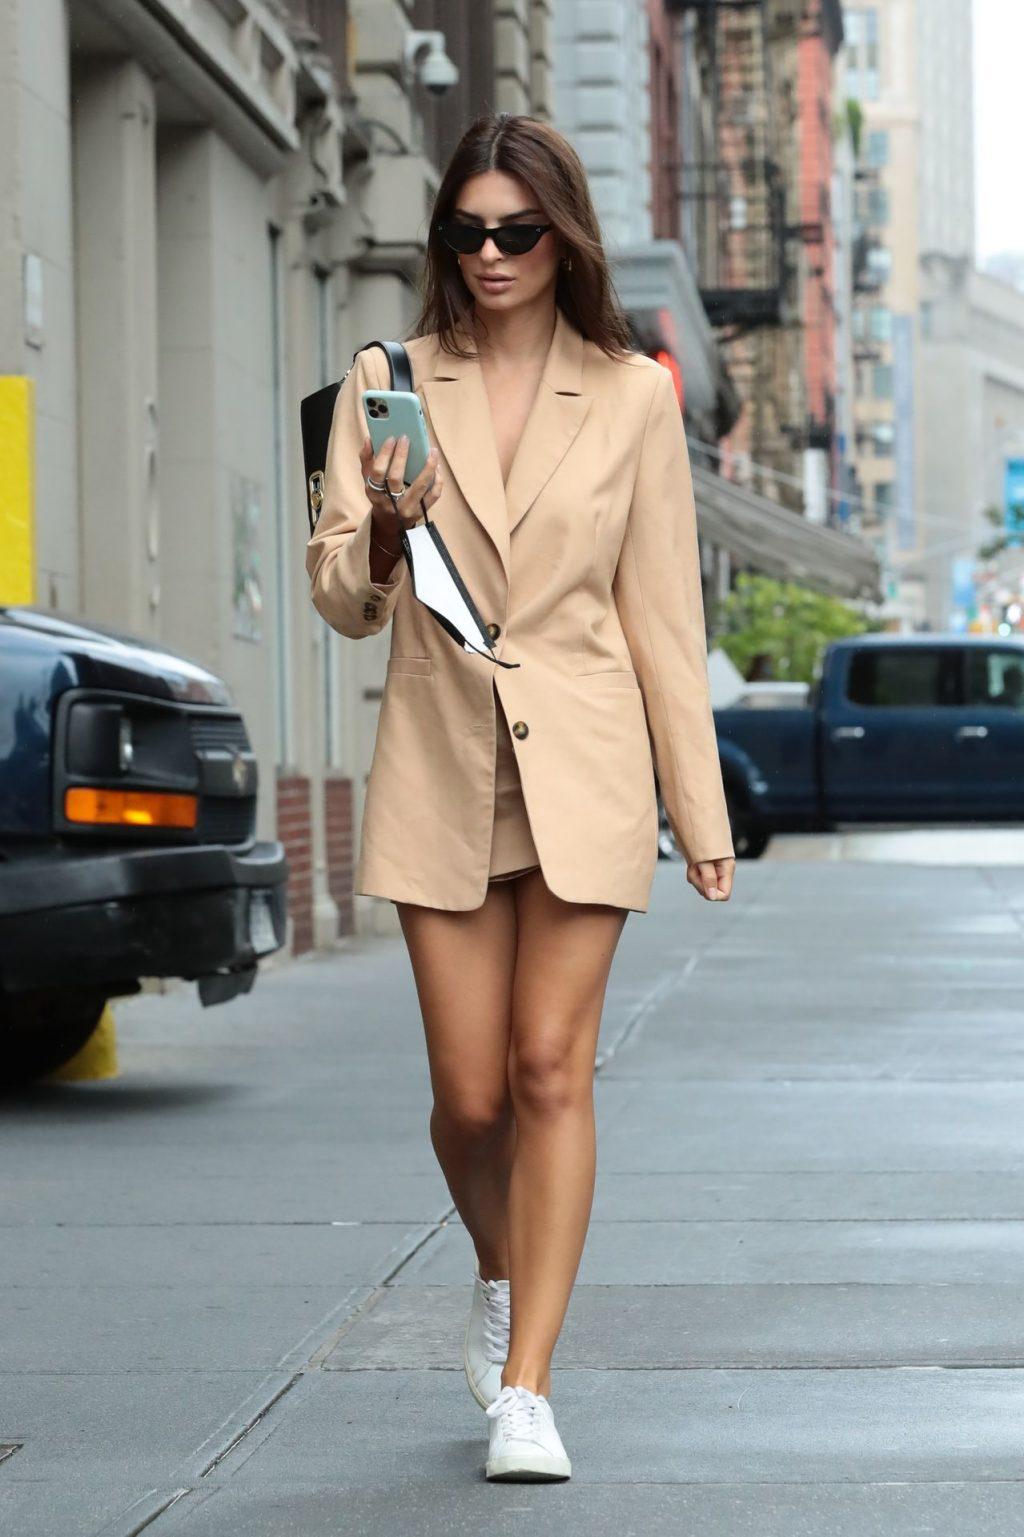 Emily Ratajkowski Looks Stylish While on a Solo Stroll in NYC (65 Photos)